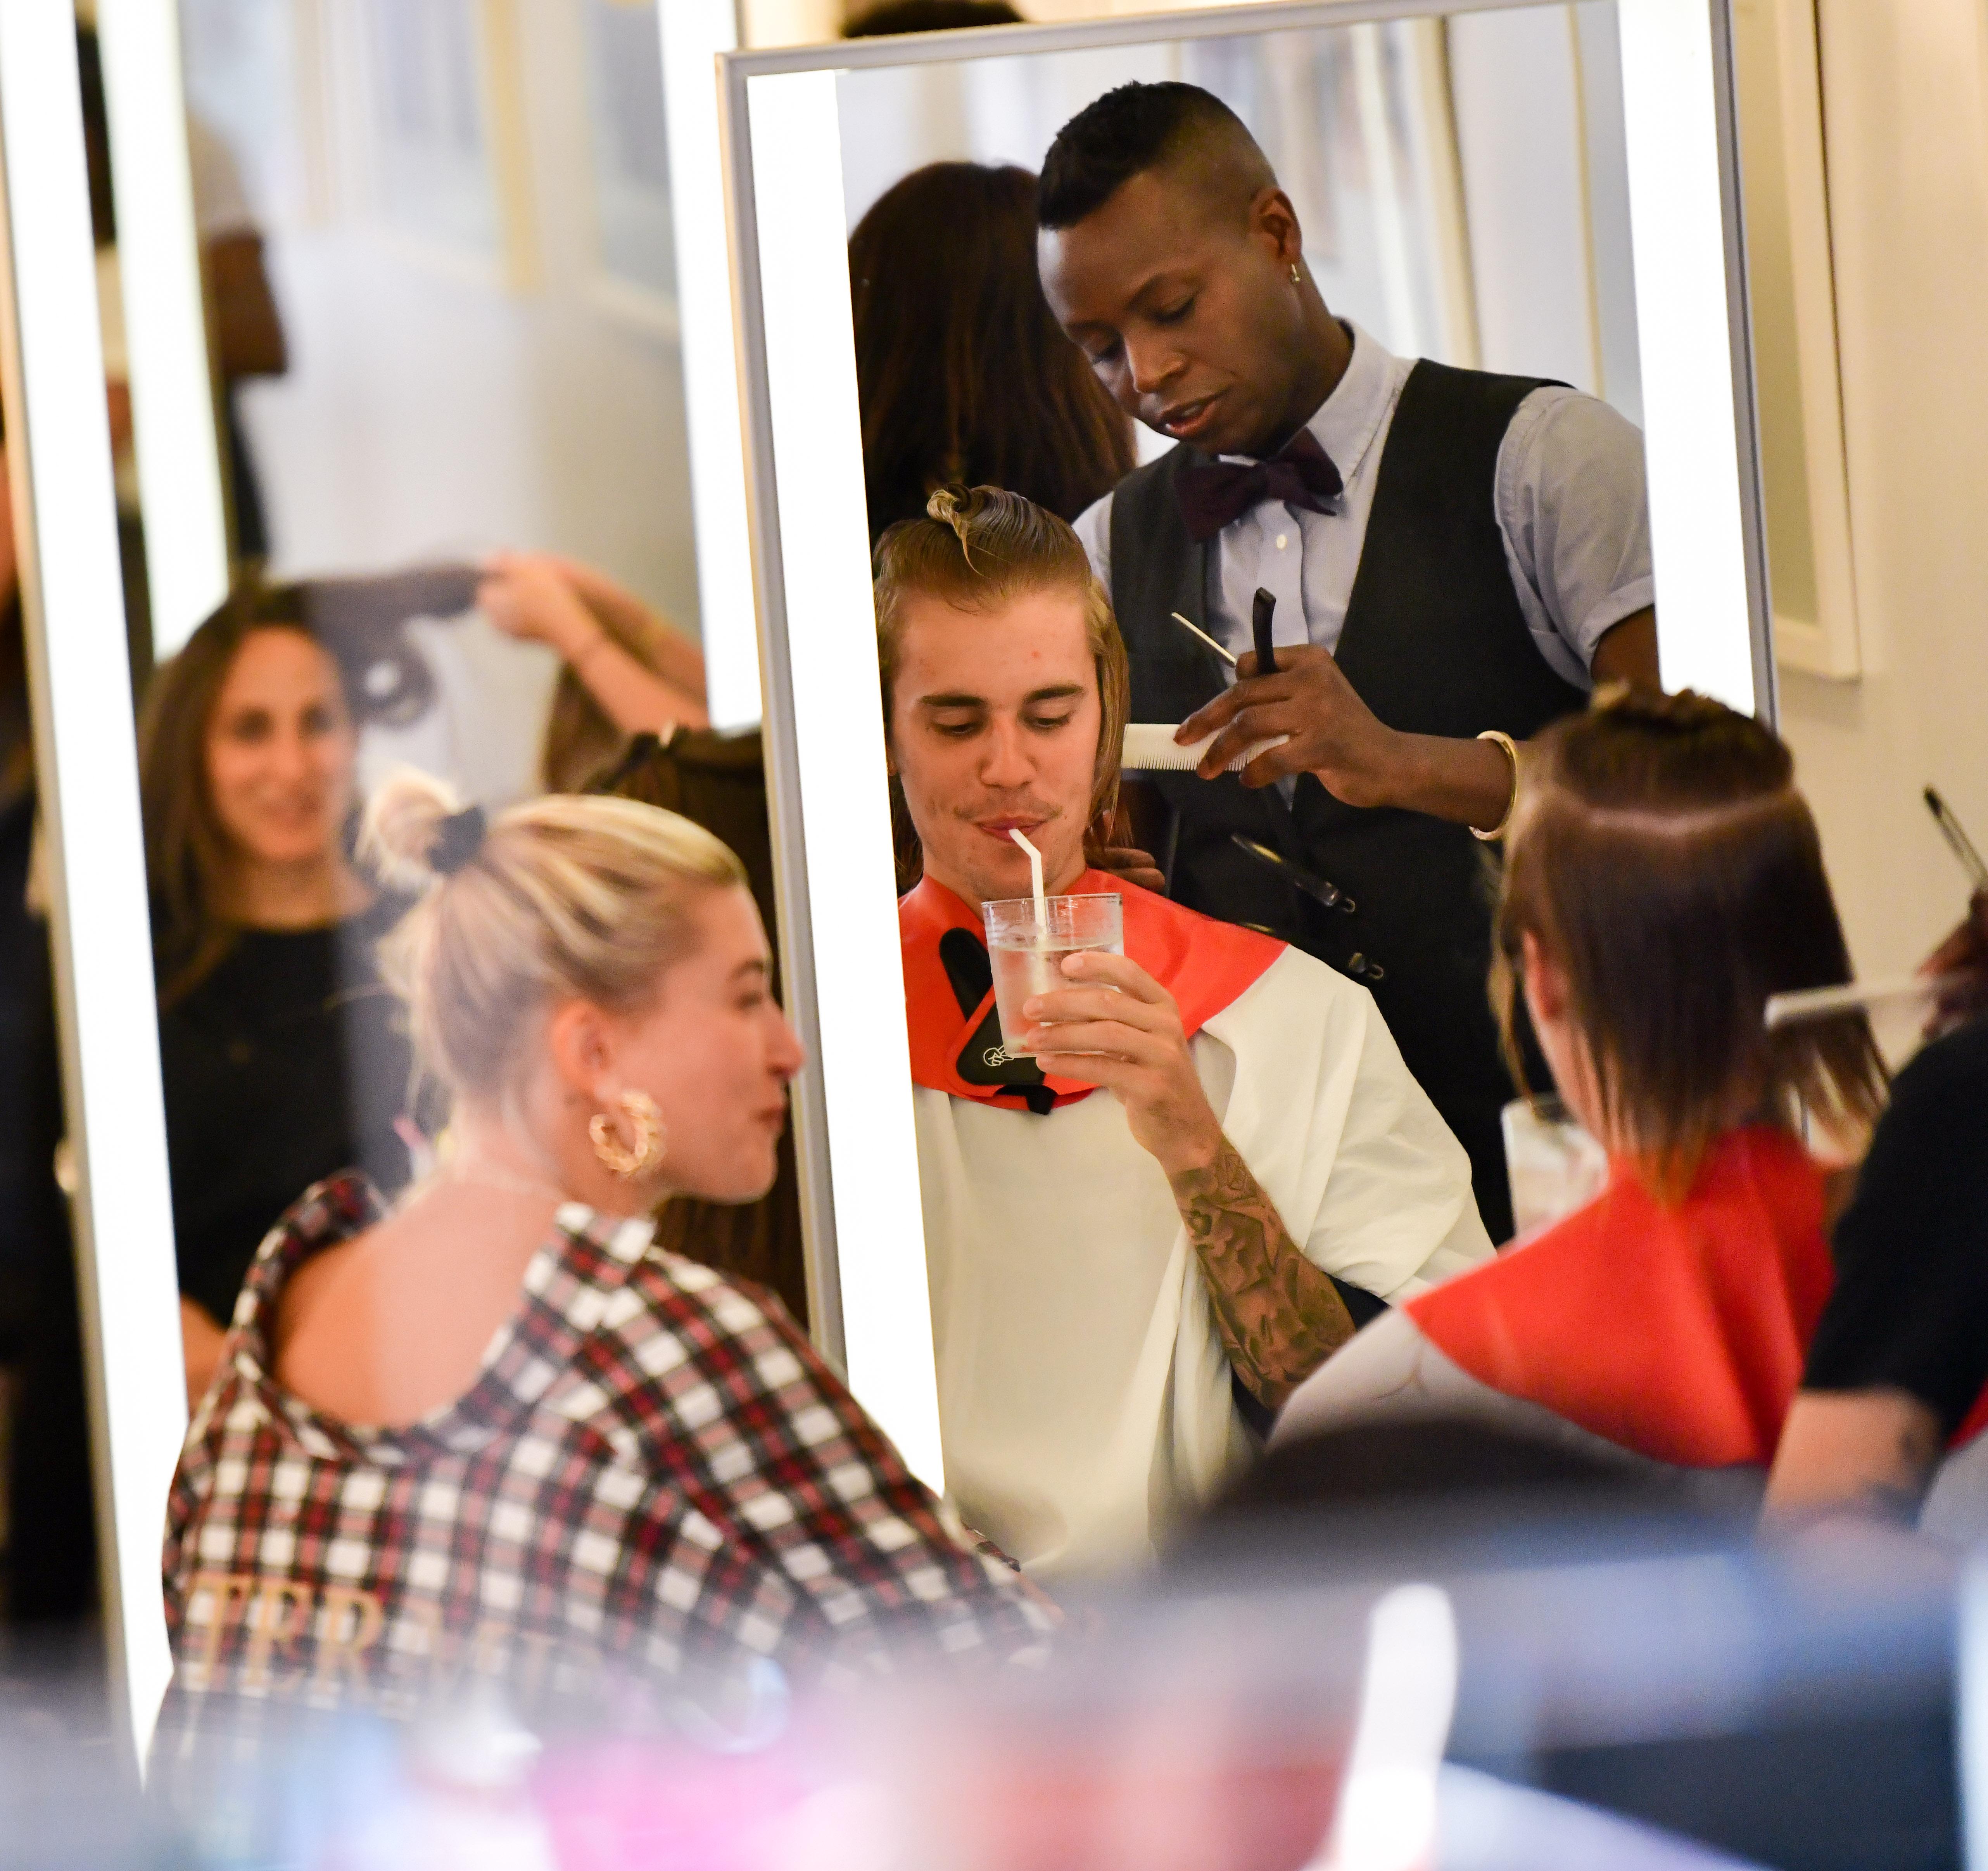 Hailey Baldwin and Justin Bieber visit Cutler hair salon in SoHo on August 8, 2018 in New York City